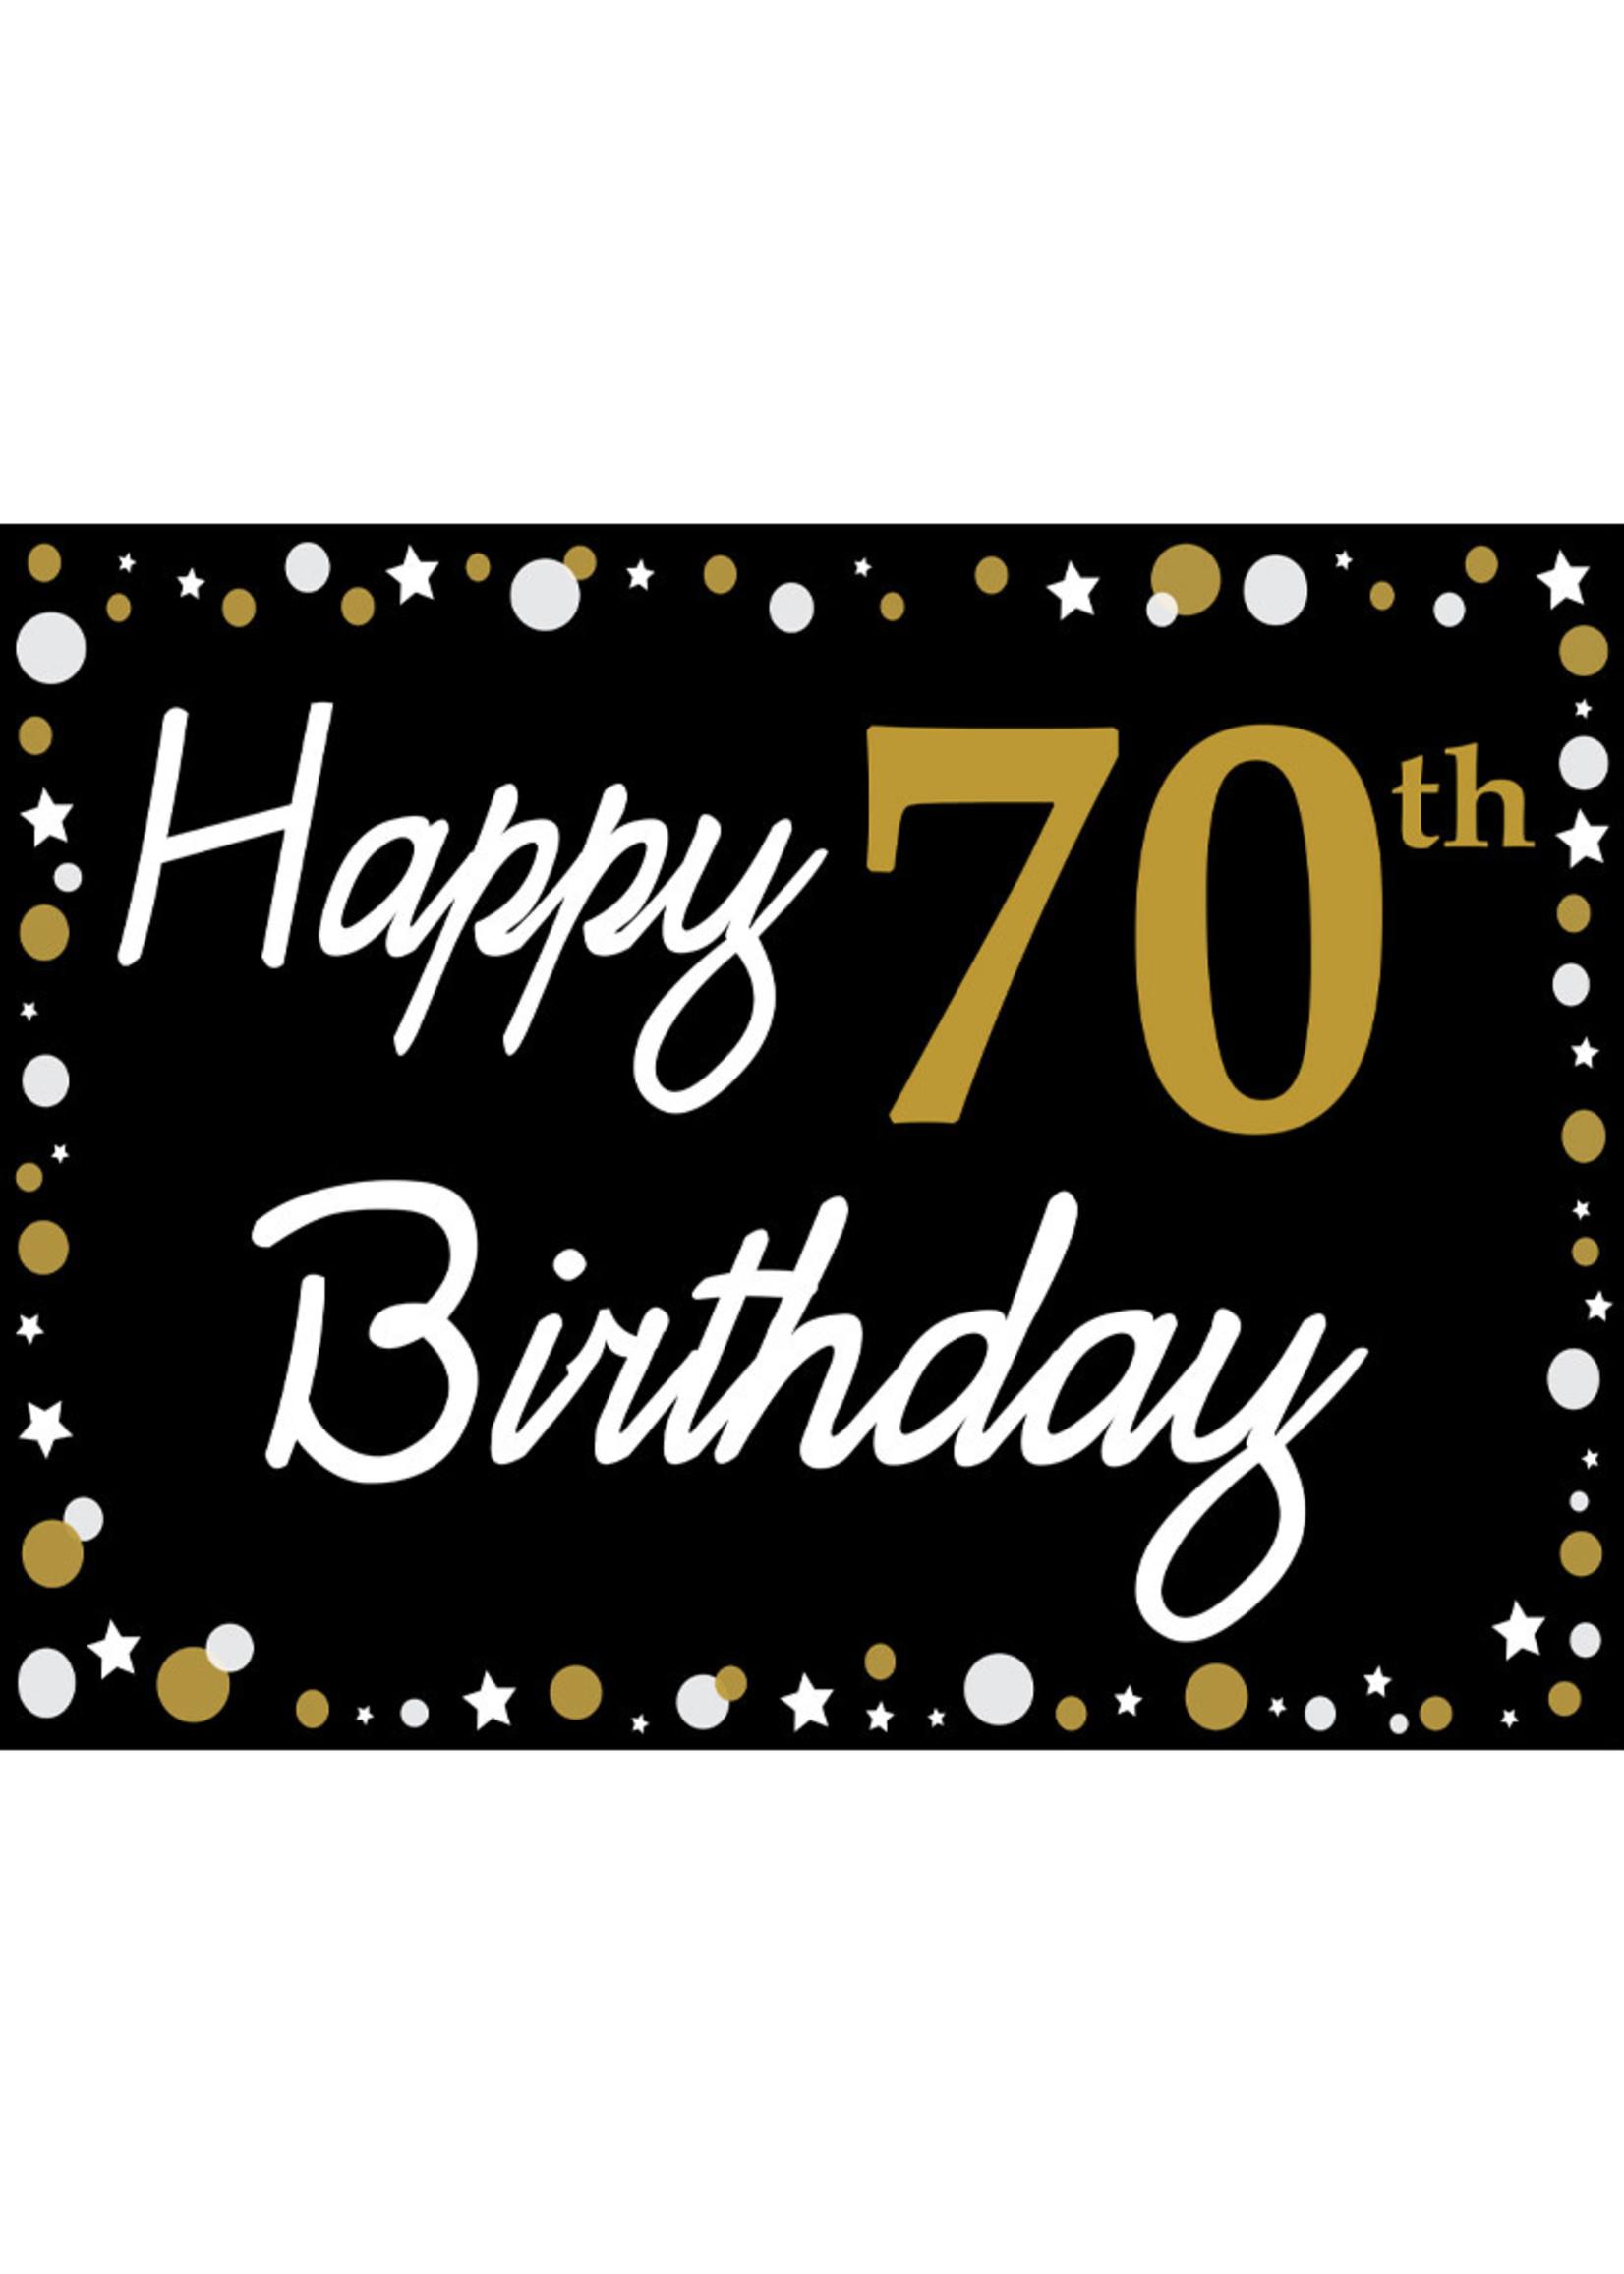 Happy 70th Birthday - Black, Gold & White Yard Sign